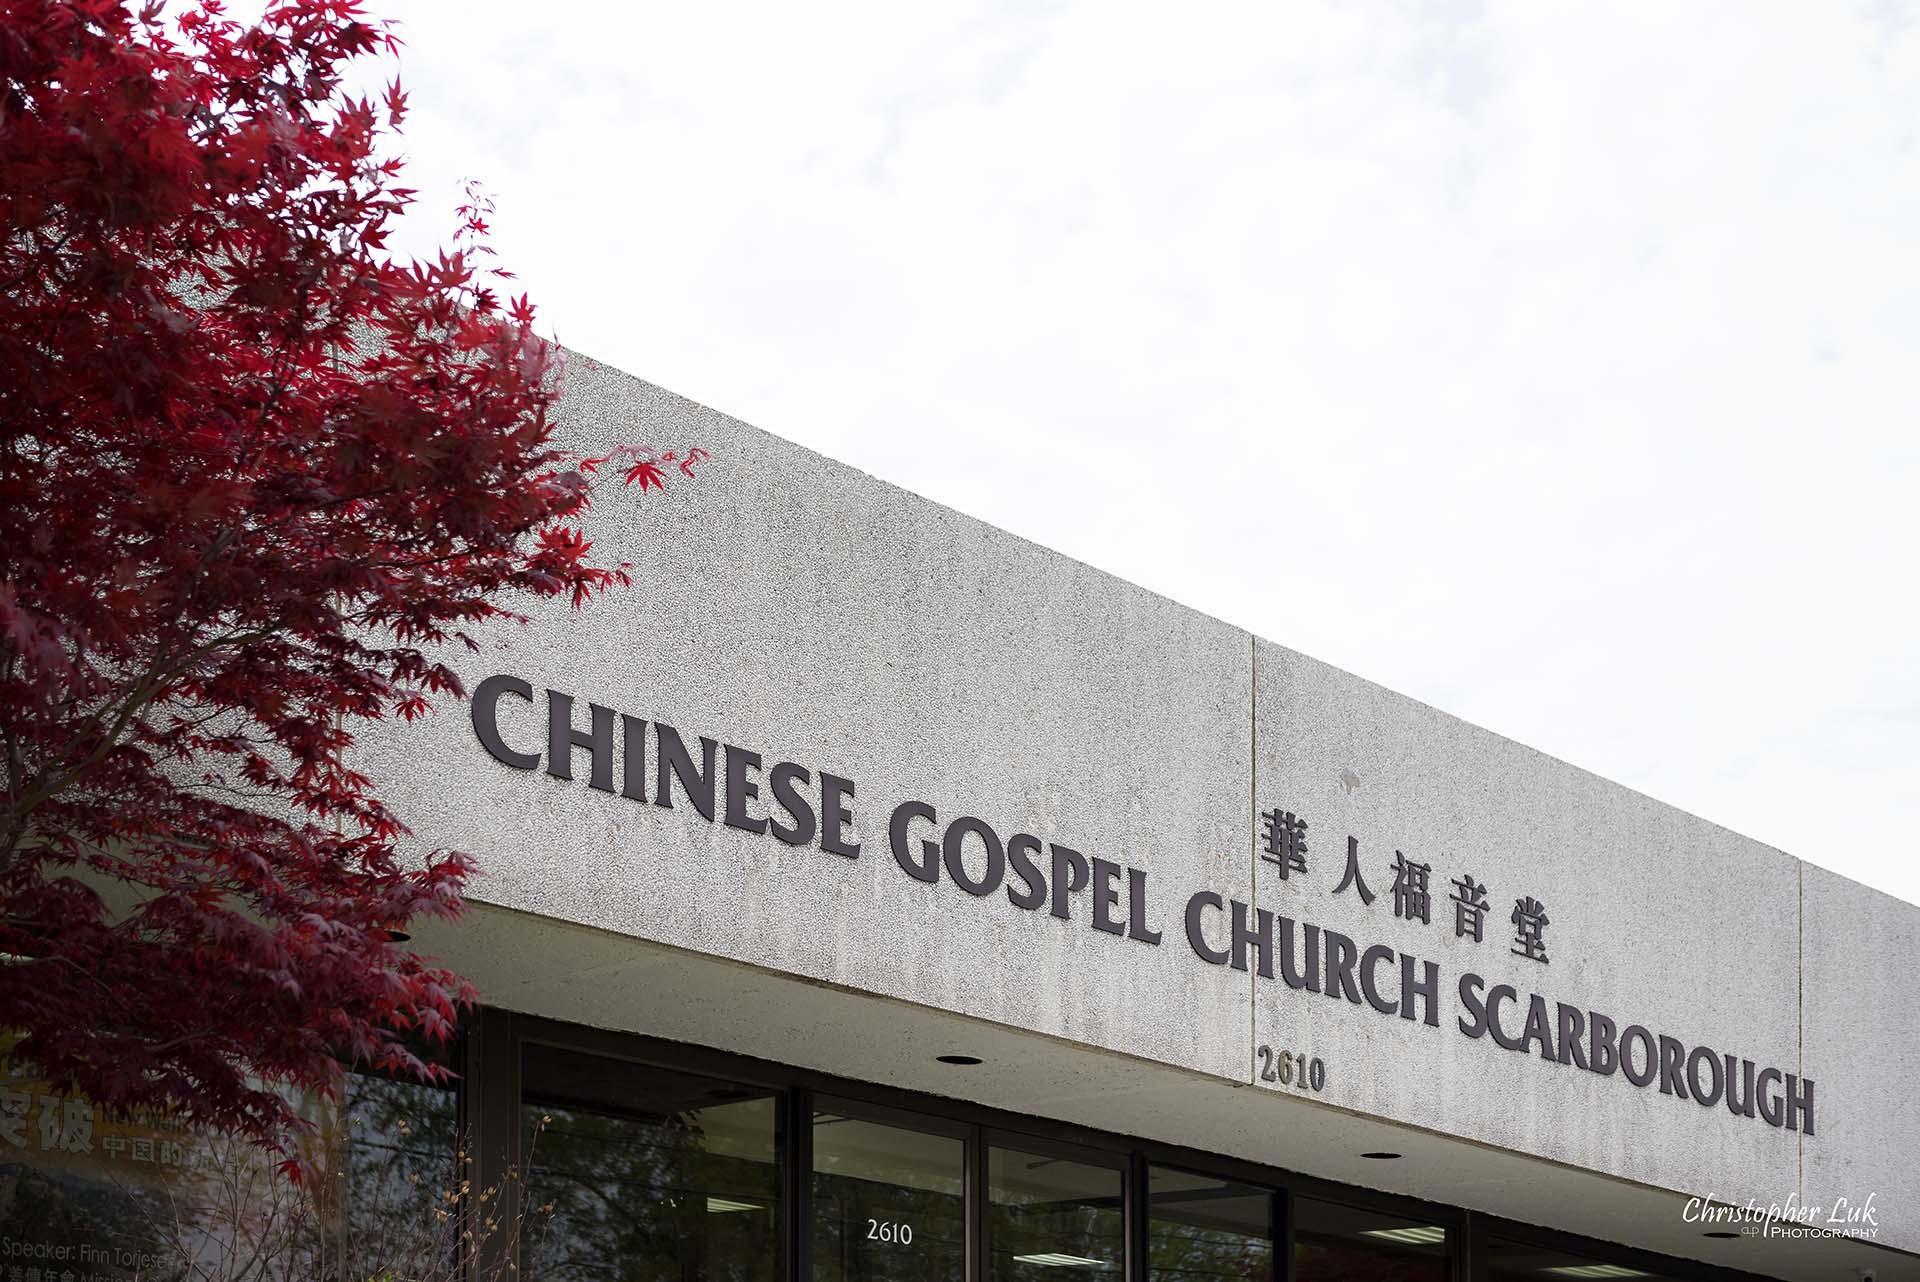 Christopher Luk Toronto Wedding Photographer Chinese Gospel Church Scarborough Ceremony Entrance Sign